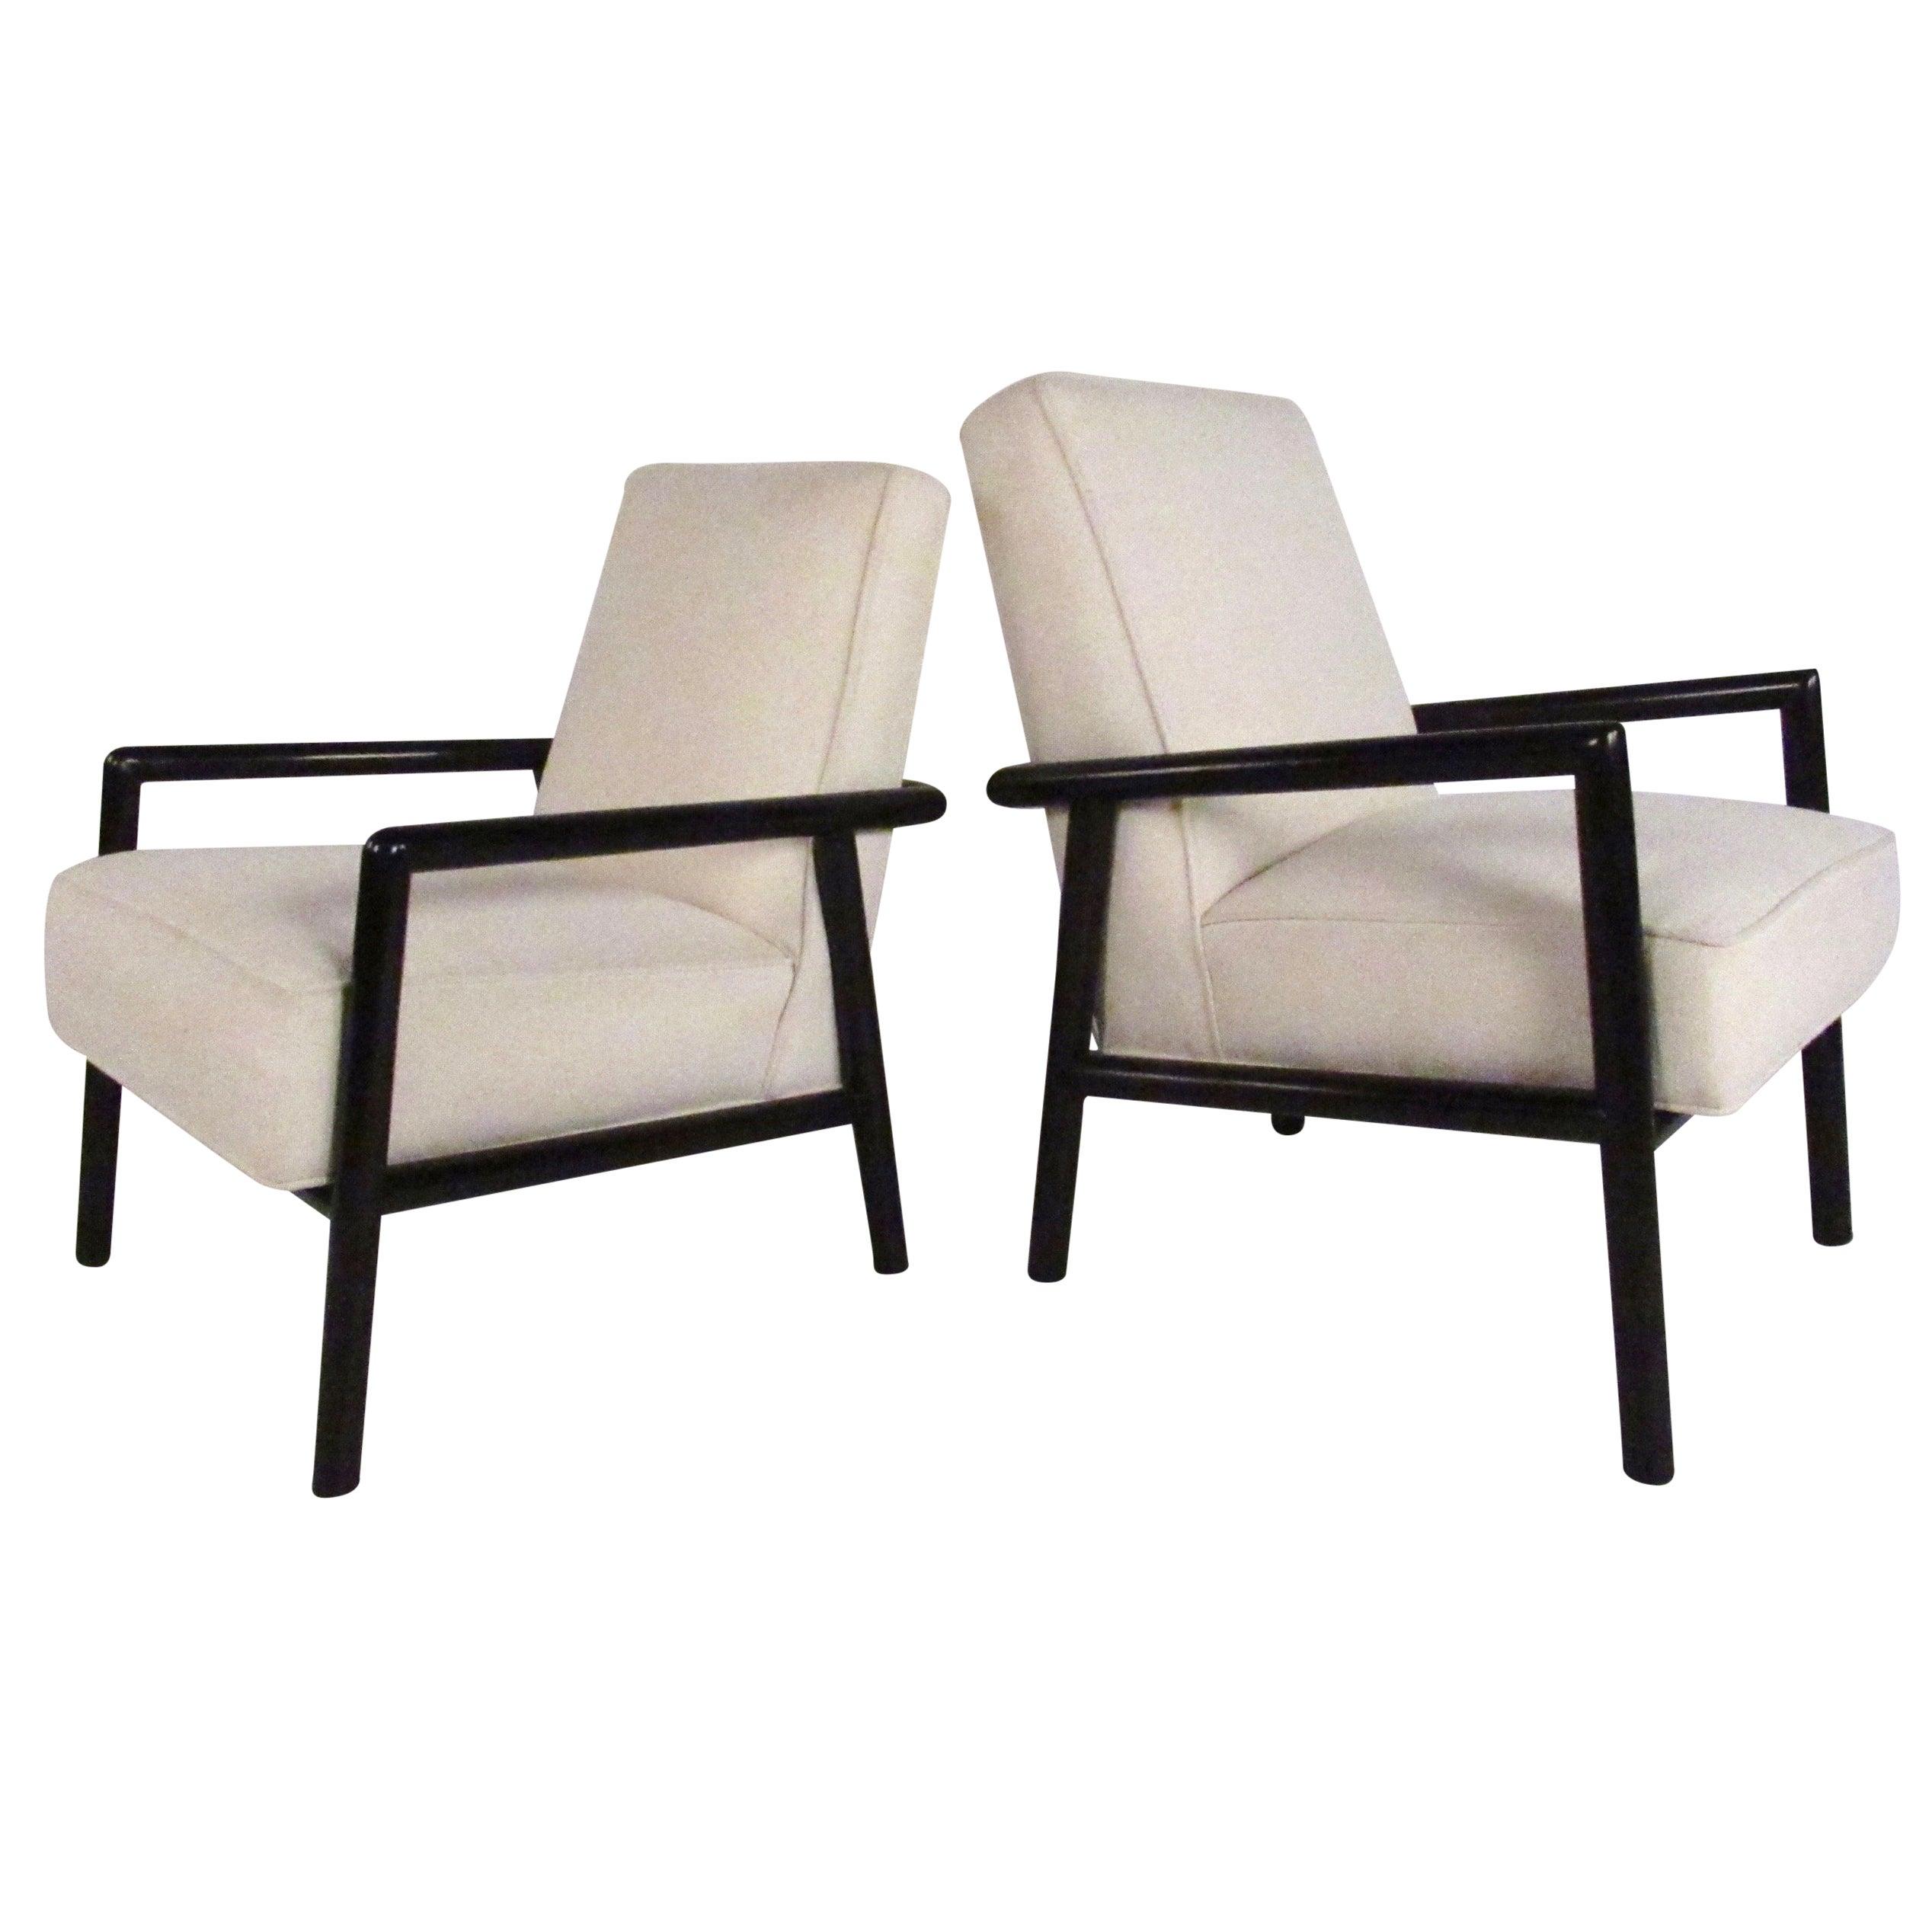 Pair of Vintage T.H. Robsjohn-Gibbings Lounge Chairs